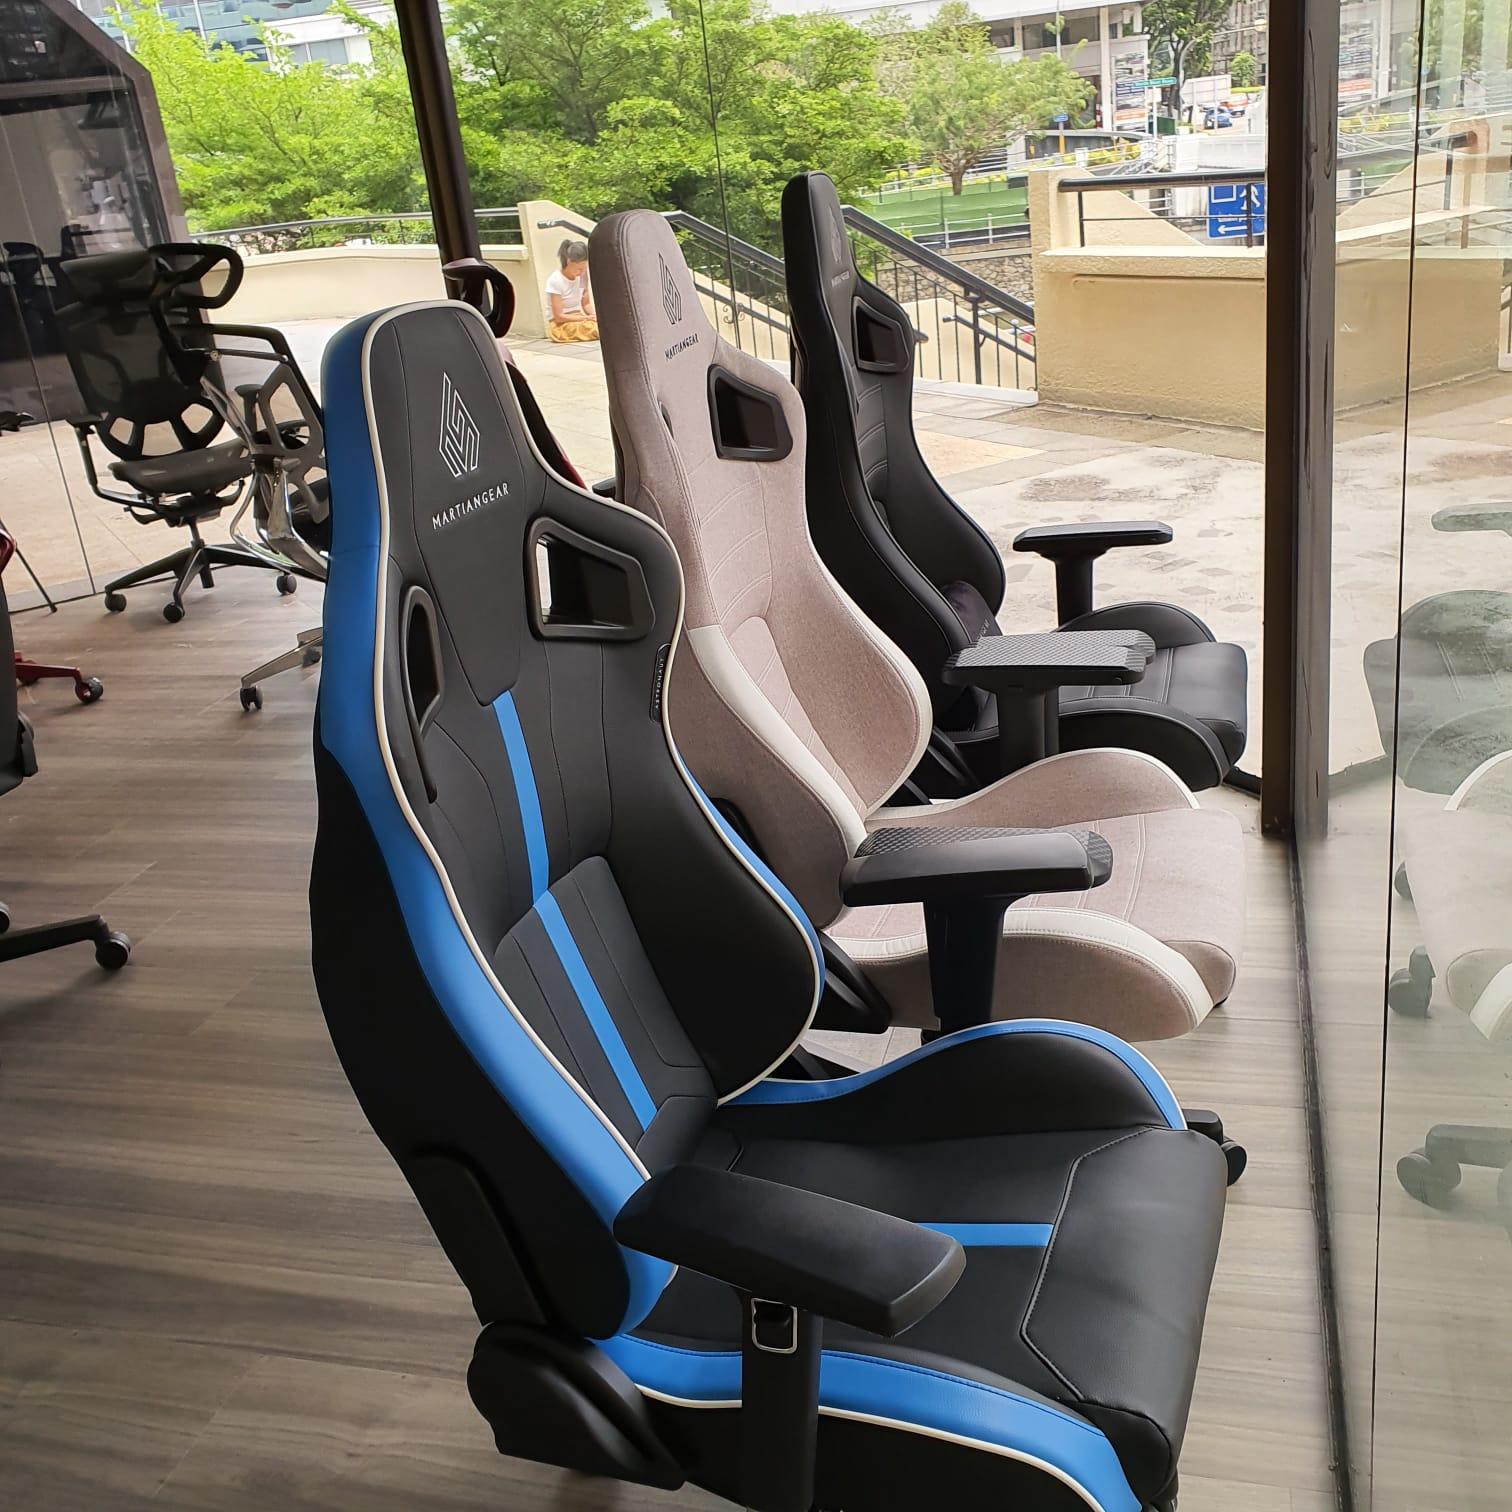 Martiangear Astronaut series Gaming Chair